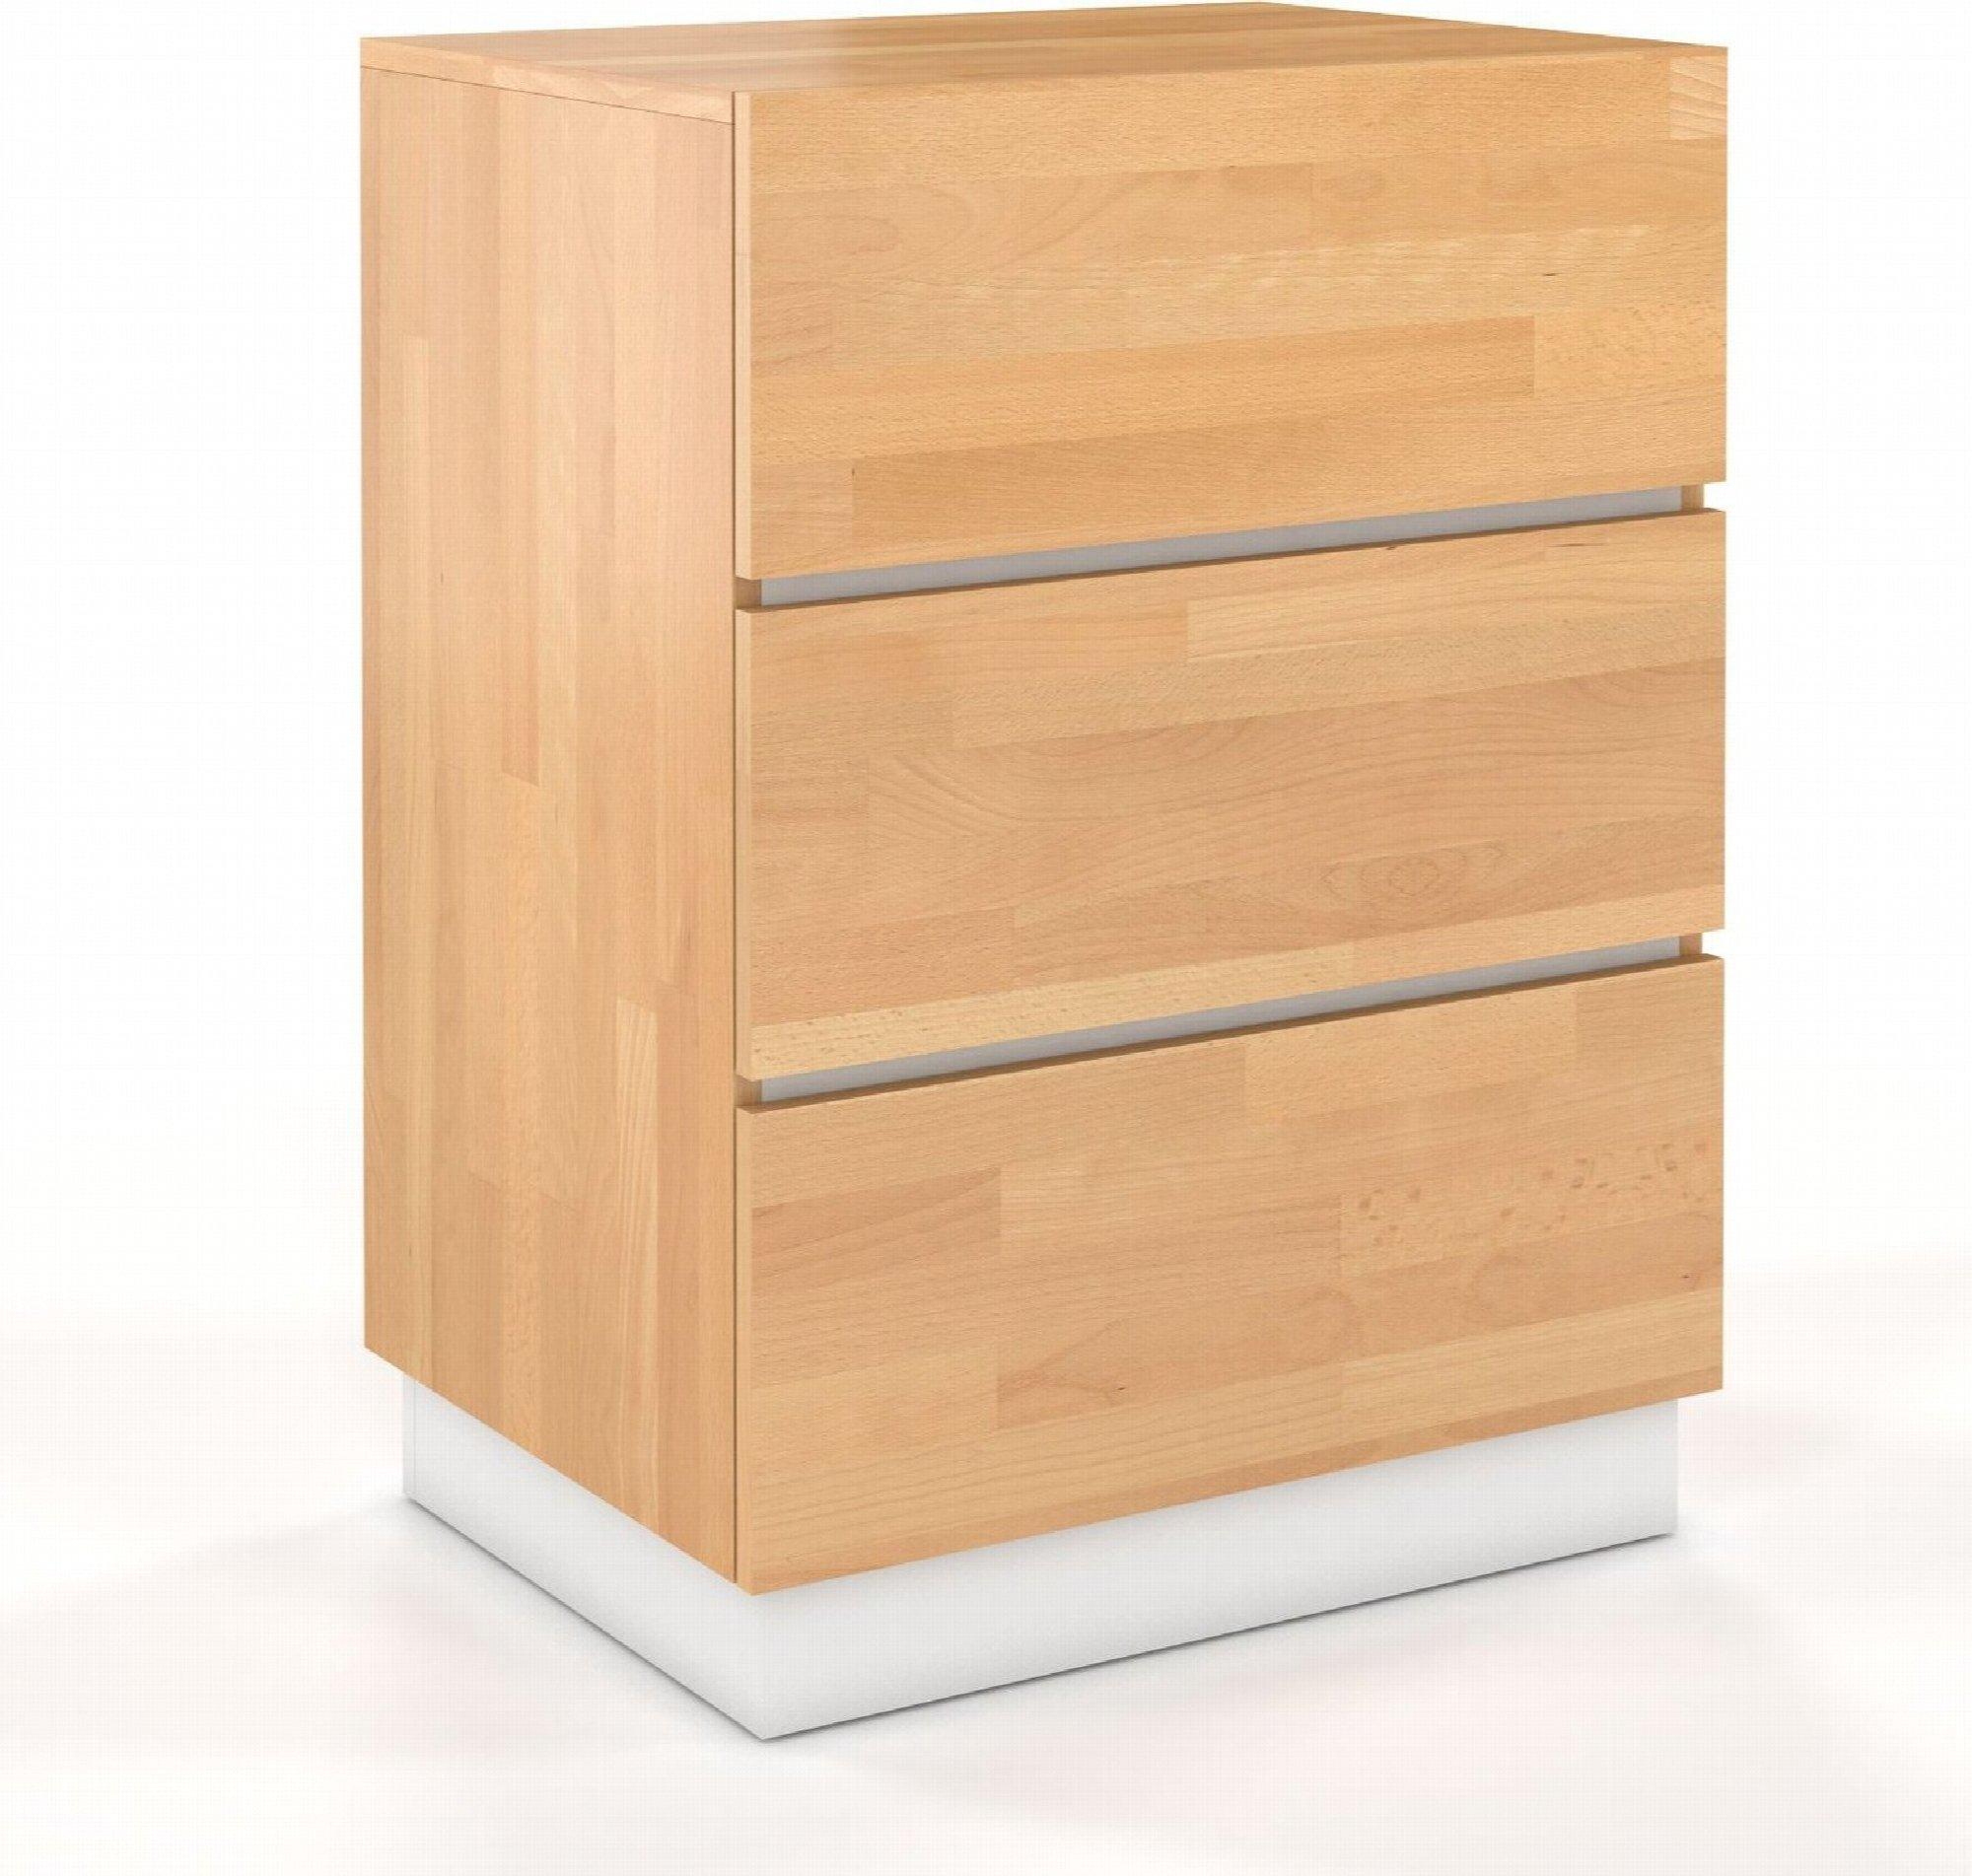 Commode en bois 3 tiroirs couleur bois chêne